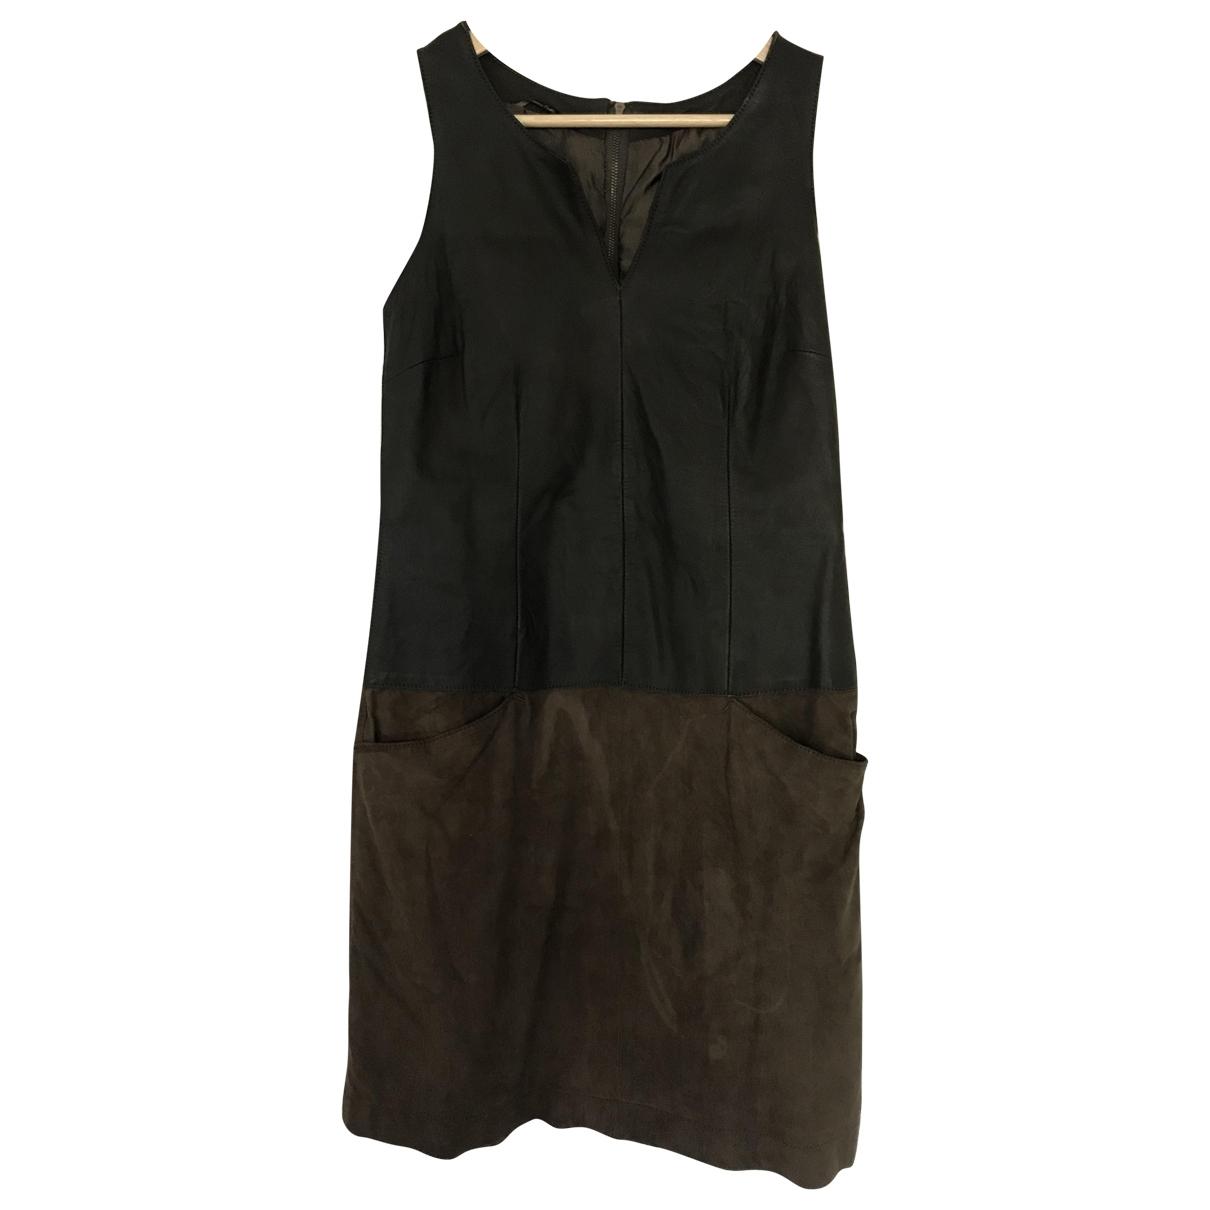 Massimo Dutti \N Khaki Leather dress for Women S International